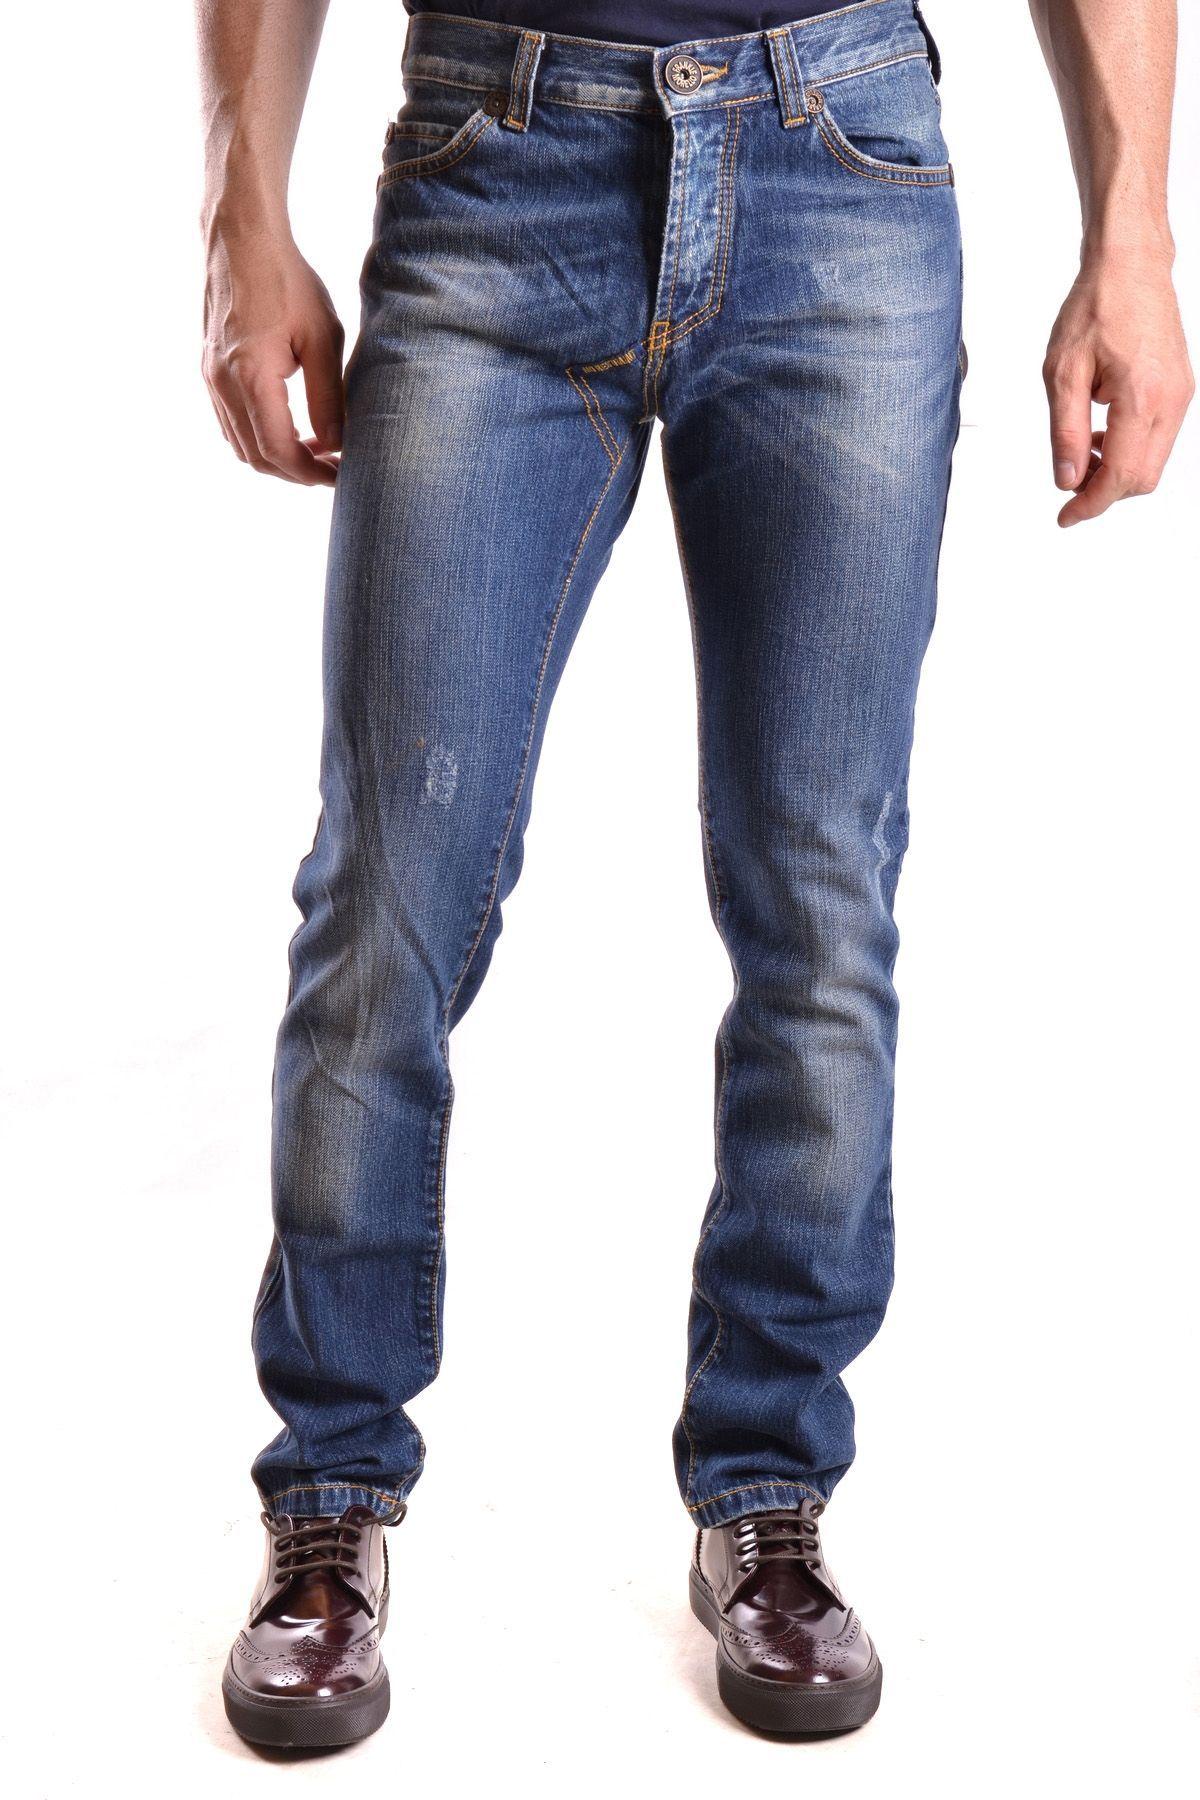 Frankie Morello Mens MCBI24810 Blue Cotton Jeans